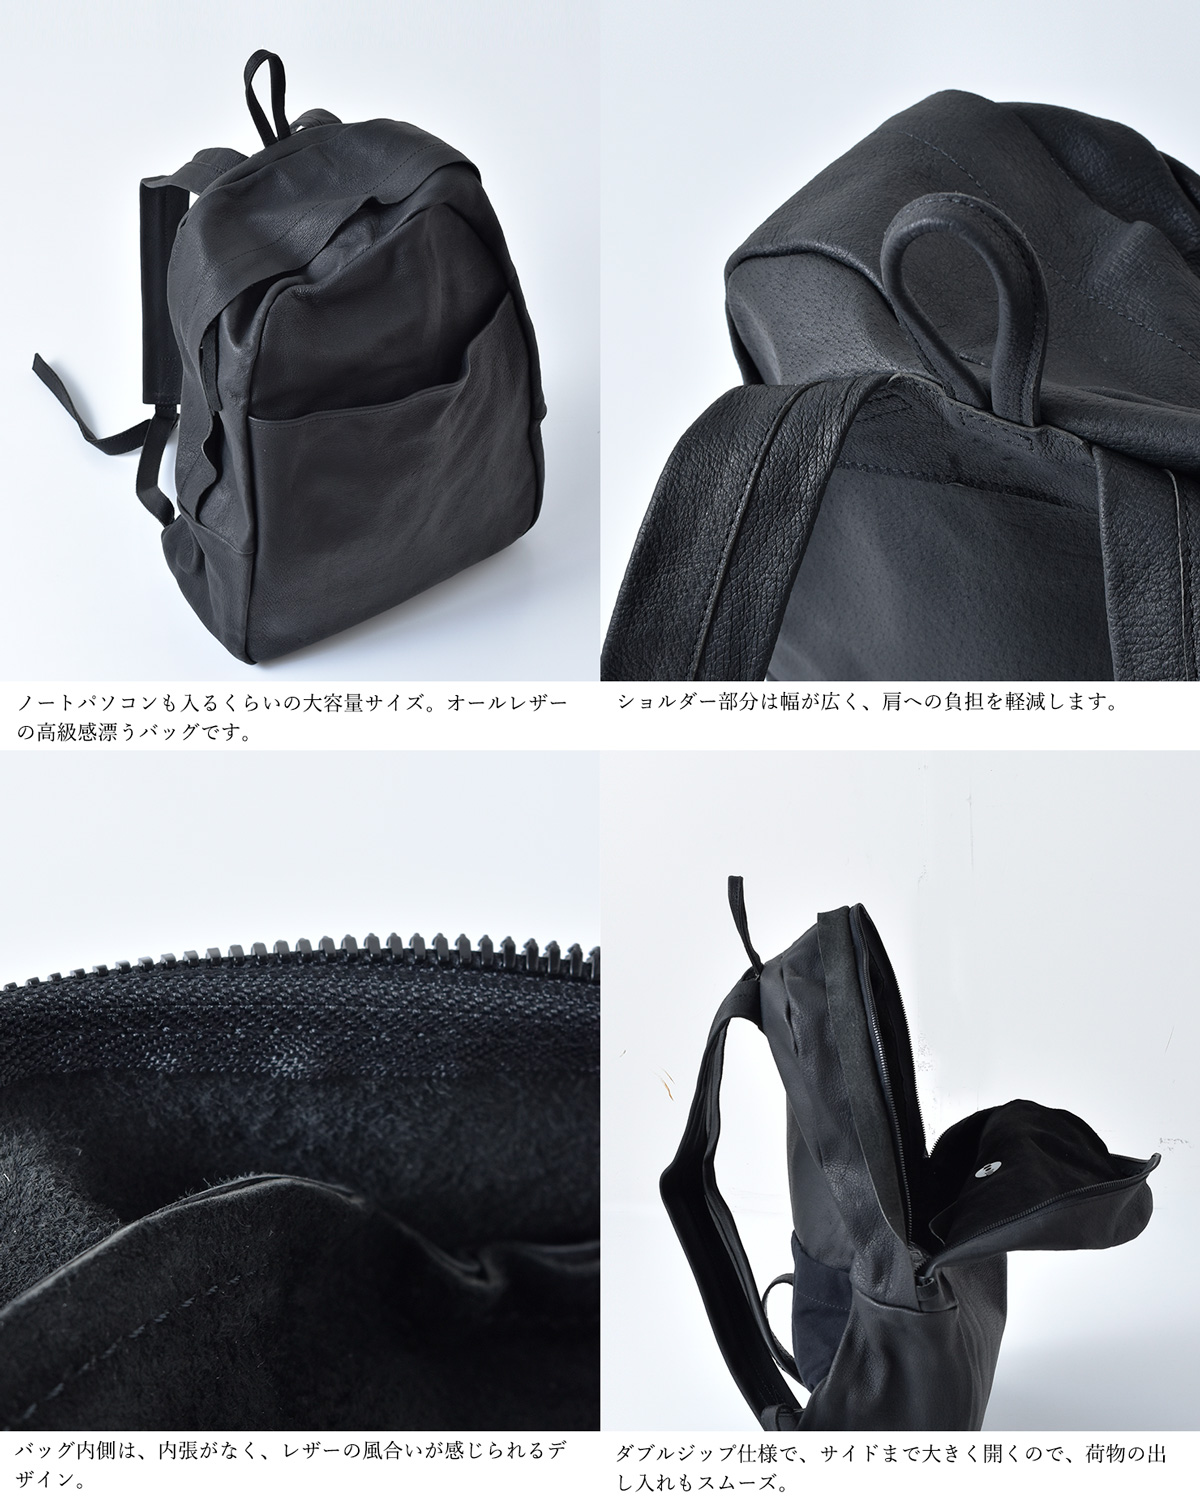 "sonor(ソナー)ウォッシュドピッグスキンバックパック""ARAI BACKPACK ICHI"" arai-backpack-ichi"